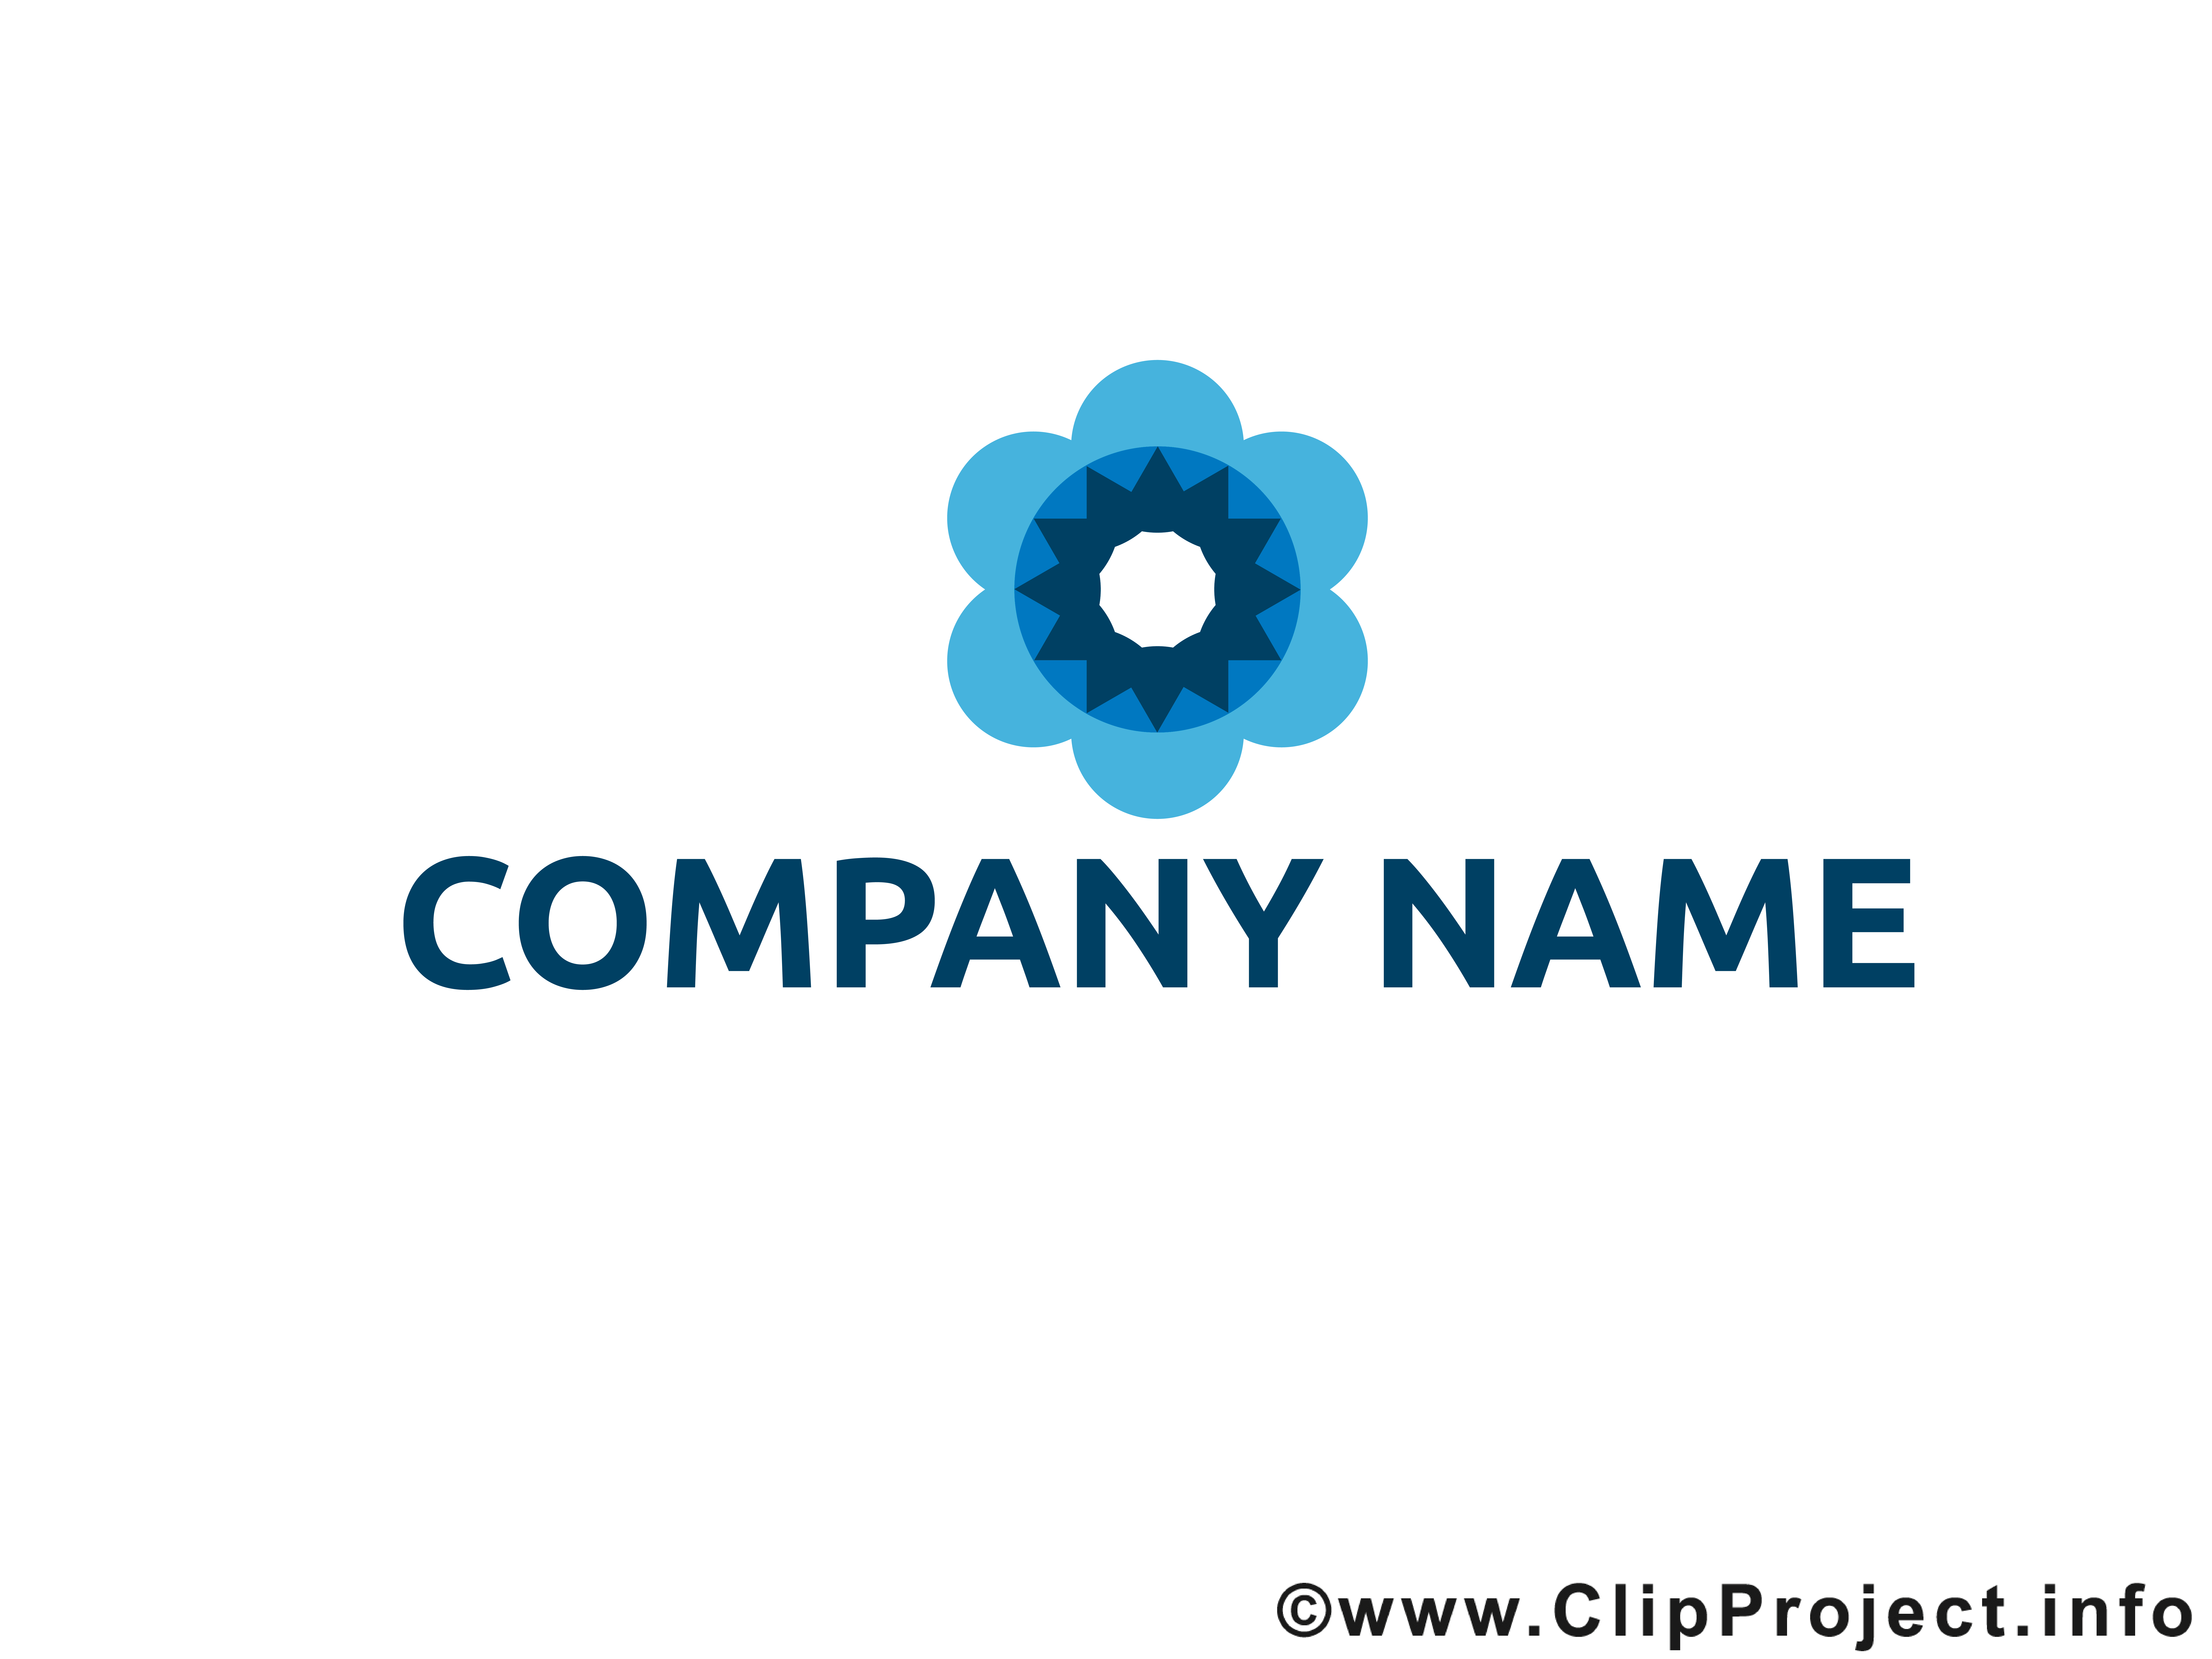 Éléments clipart – Logo dessins gratuits